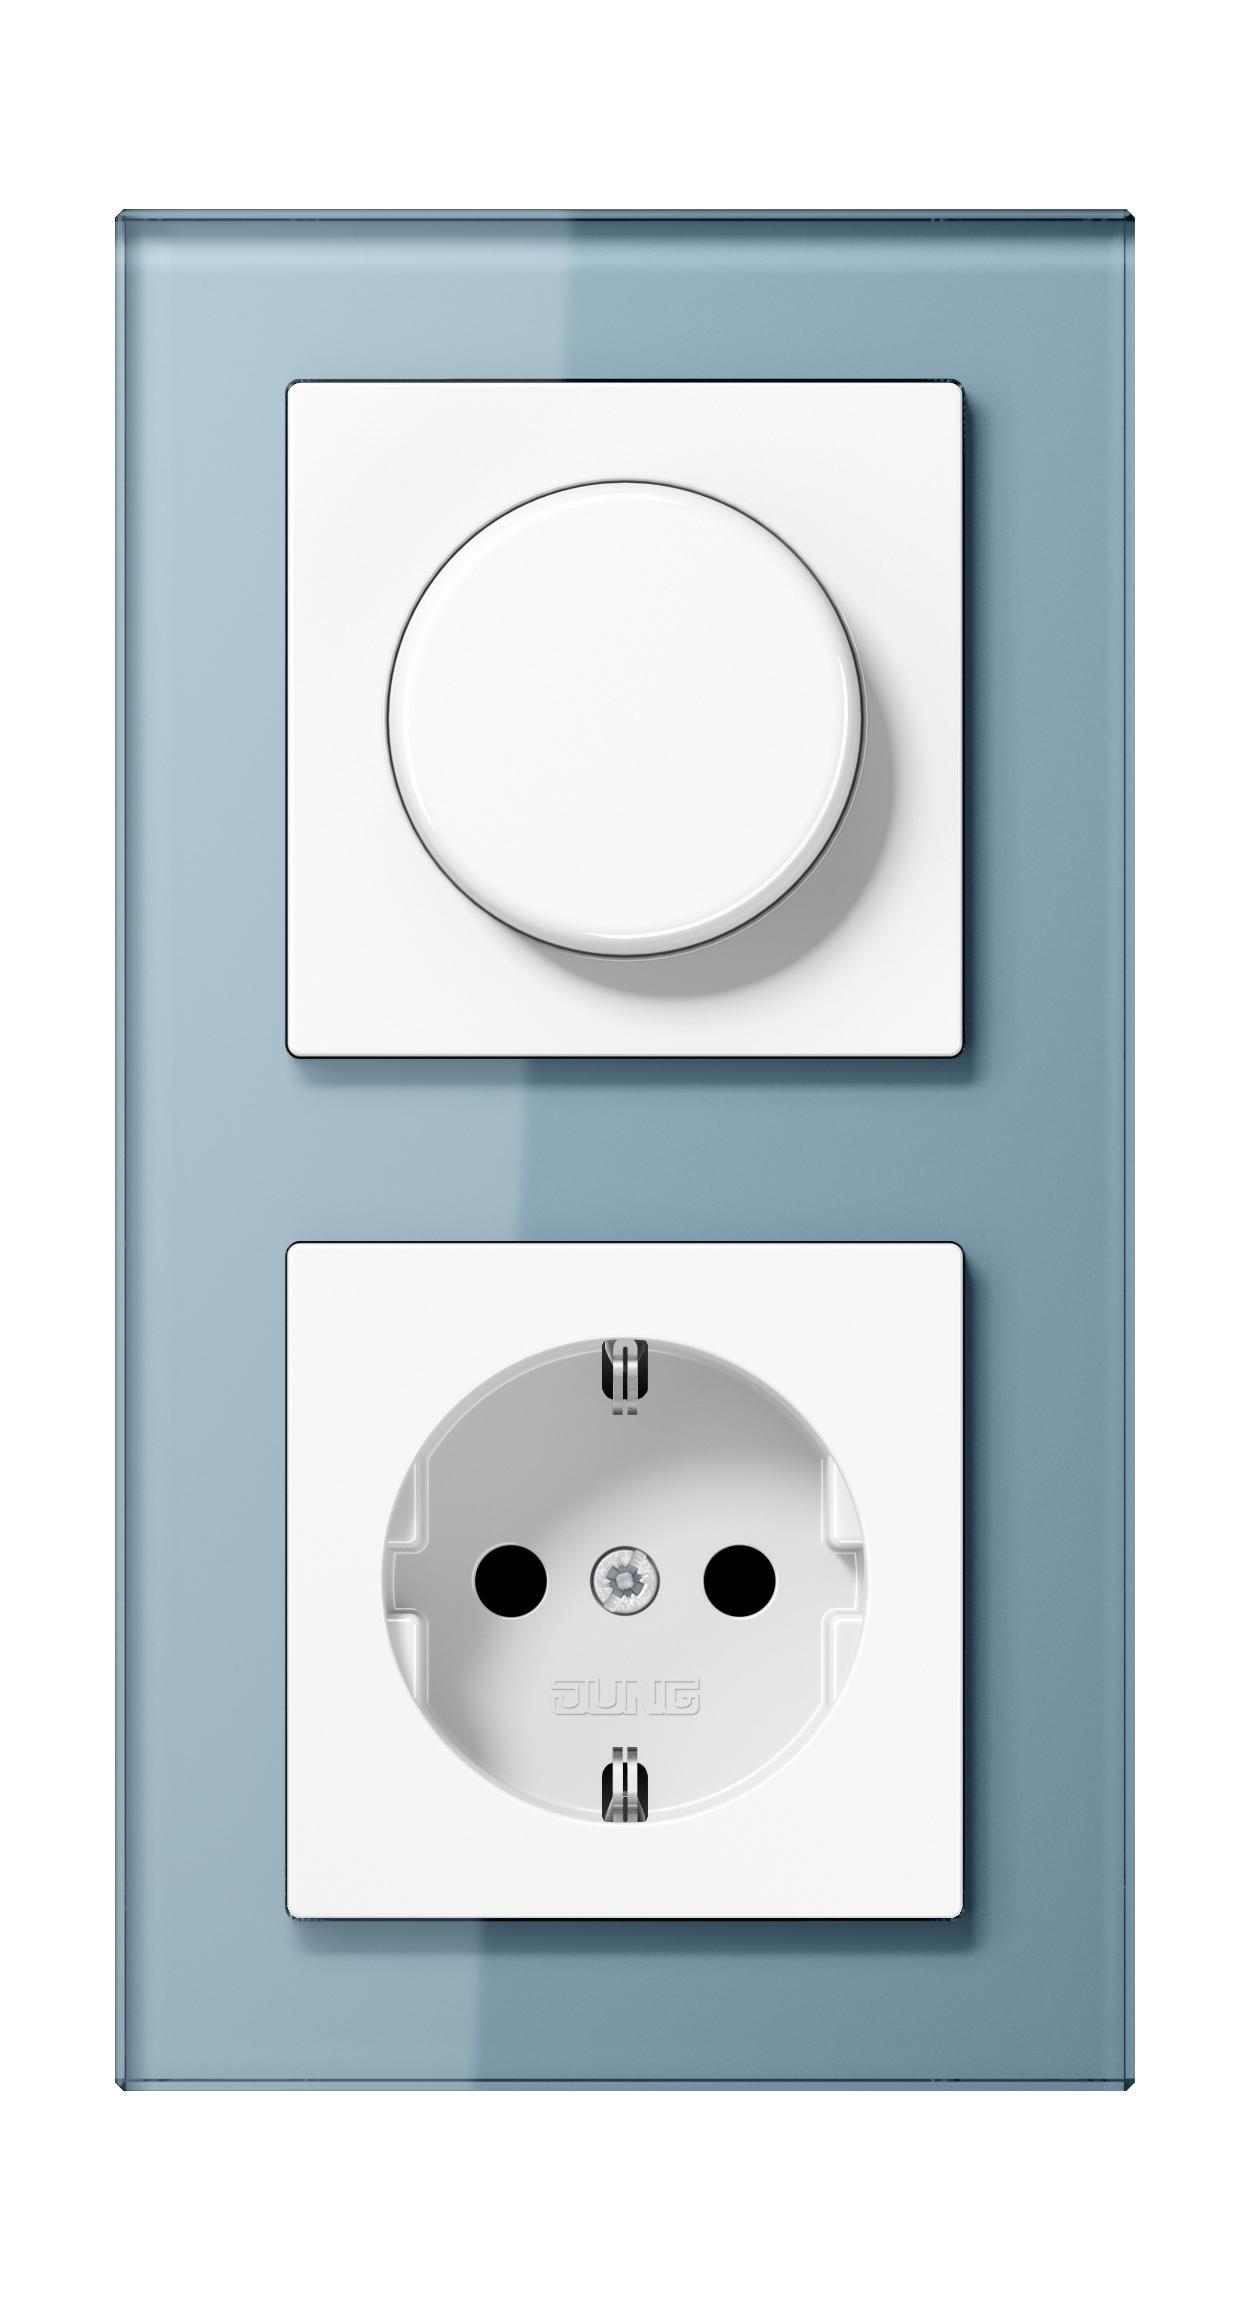 JUNG_AC_GL_blue-grey_dimmer-socket